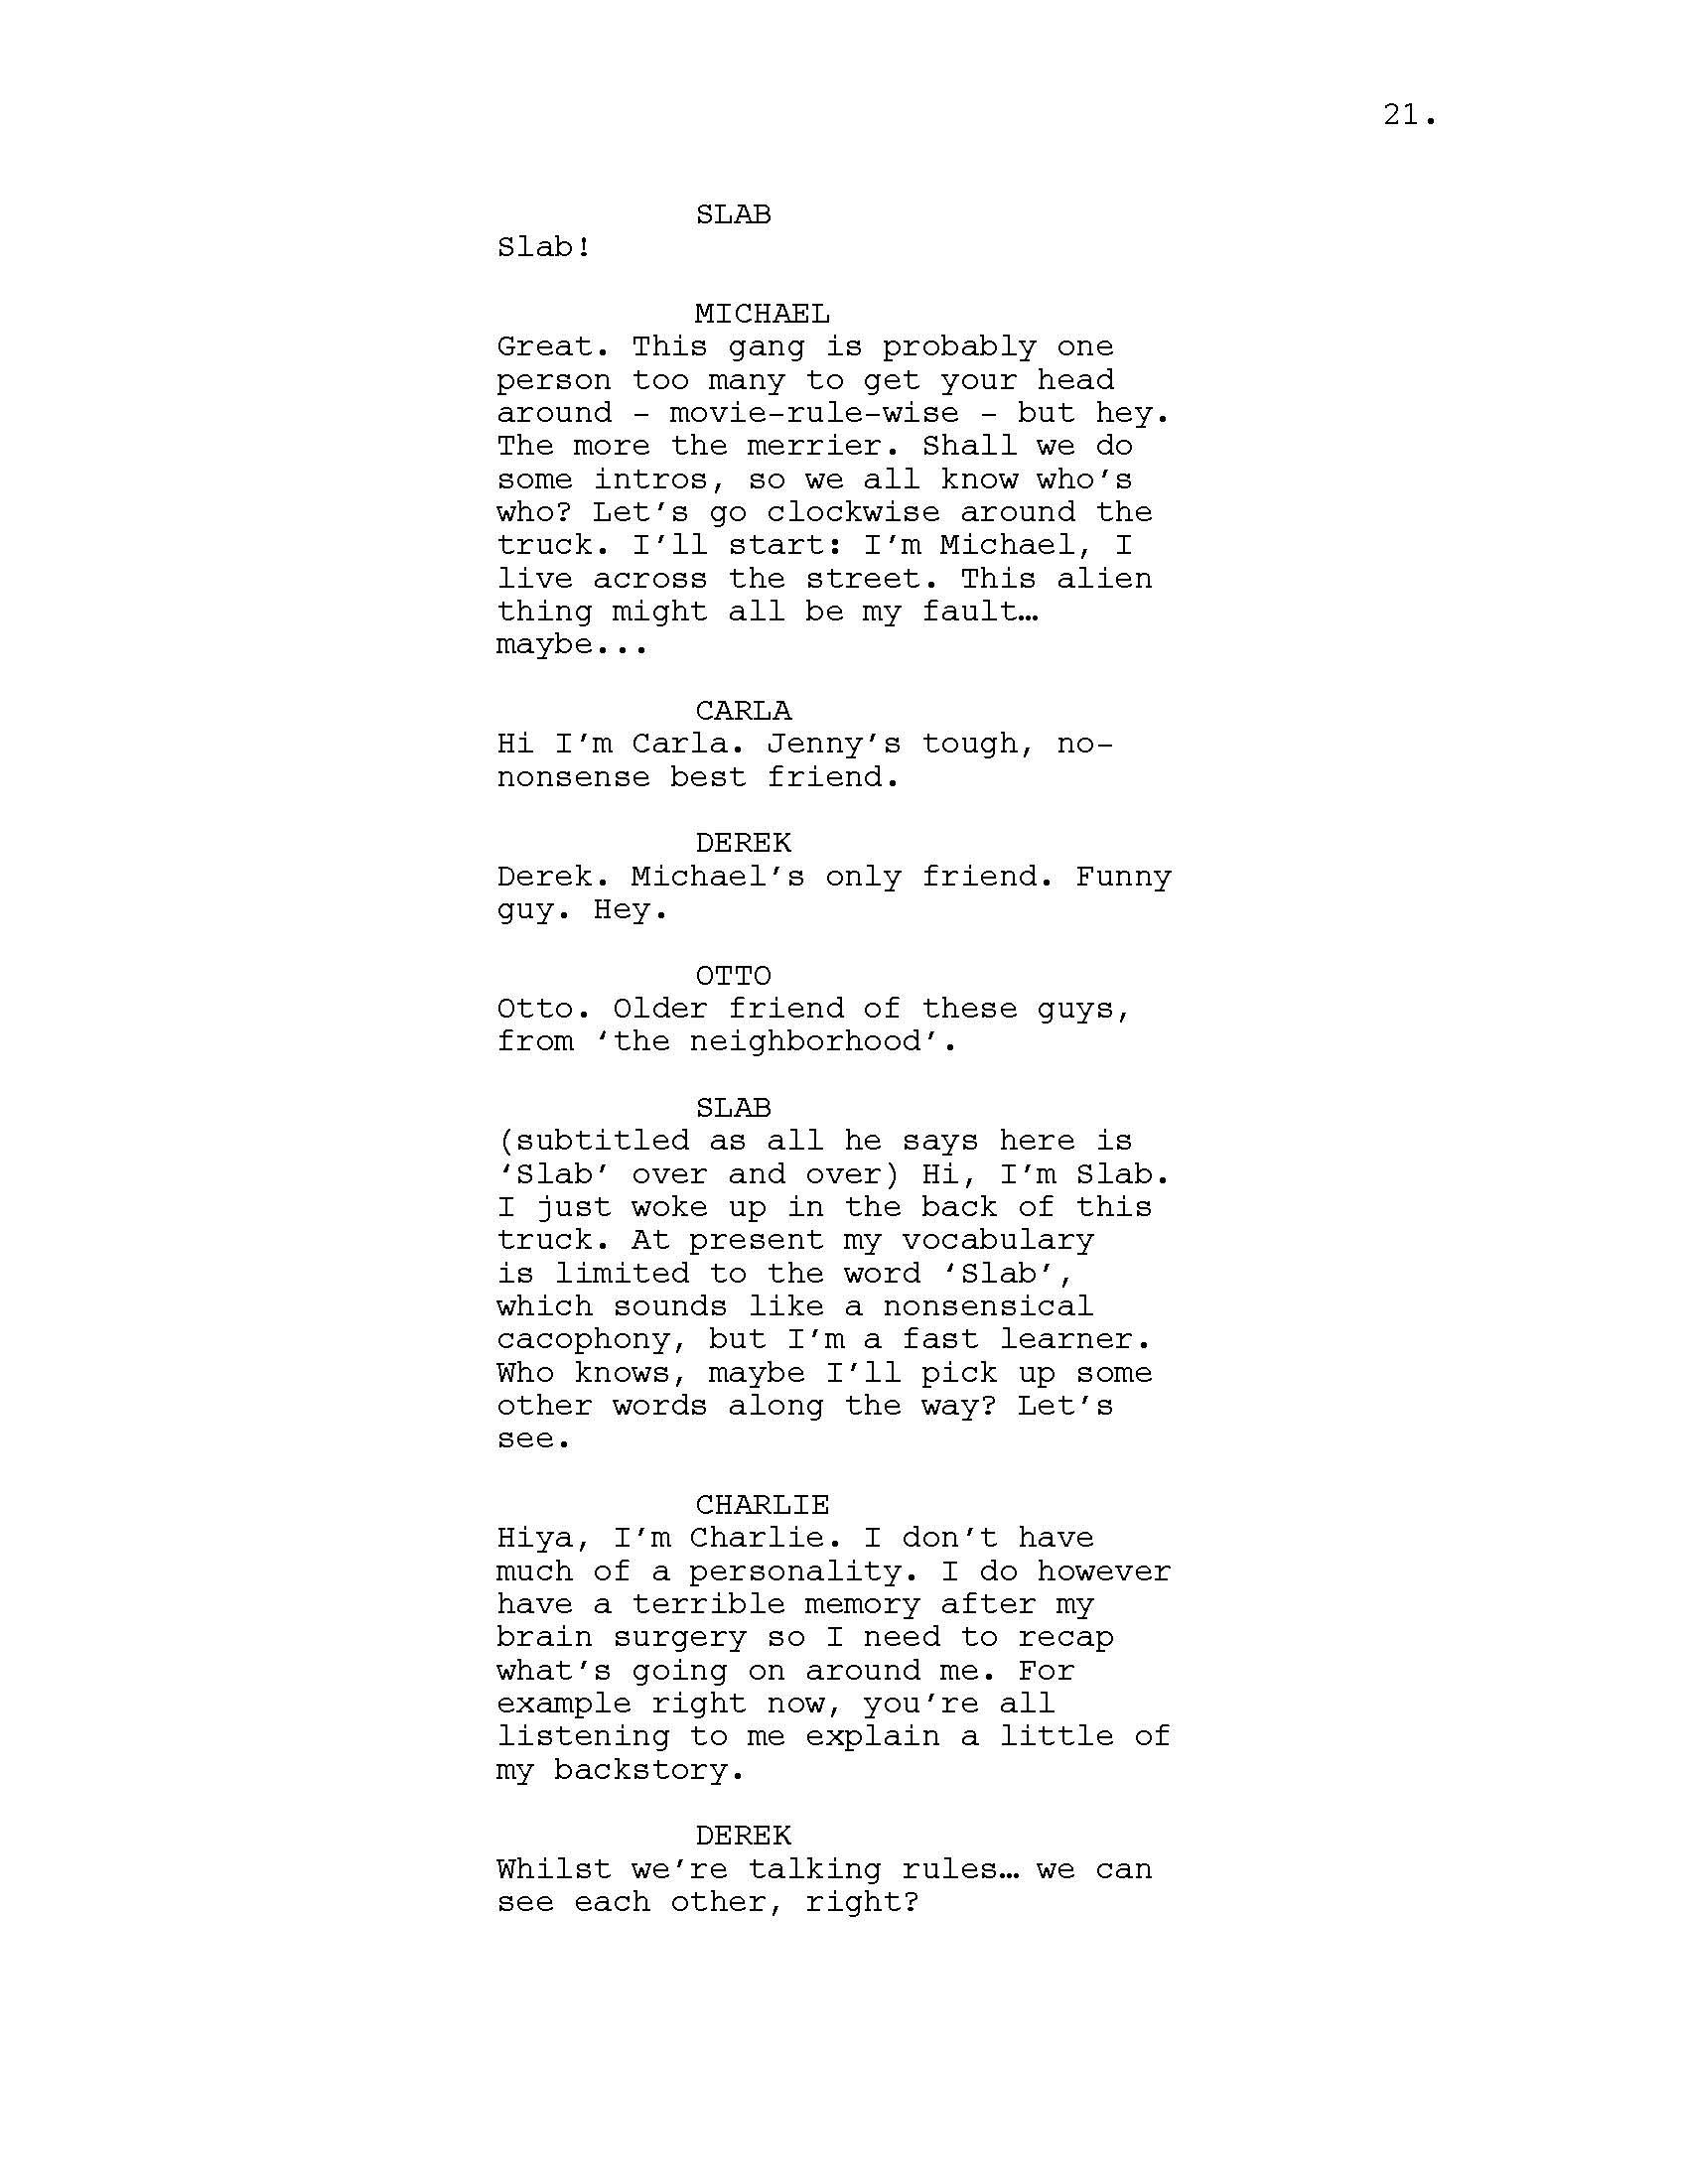 INVISIBLE WORLD SCRIPT_Page_022.jpg